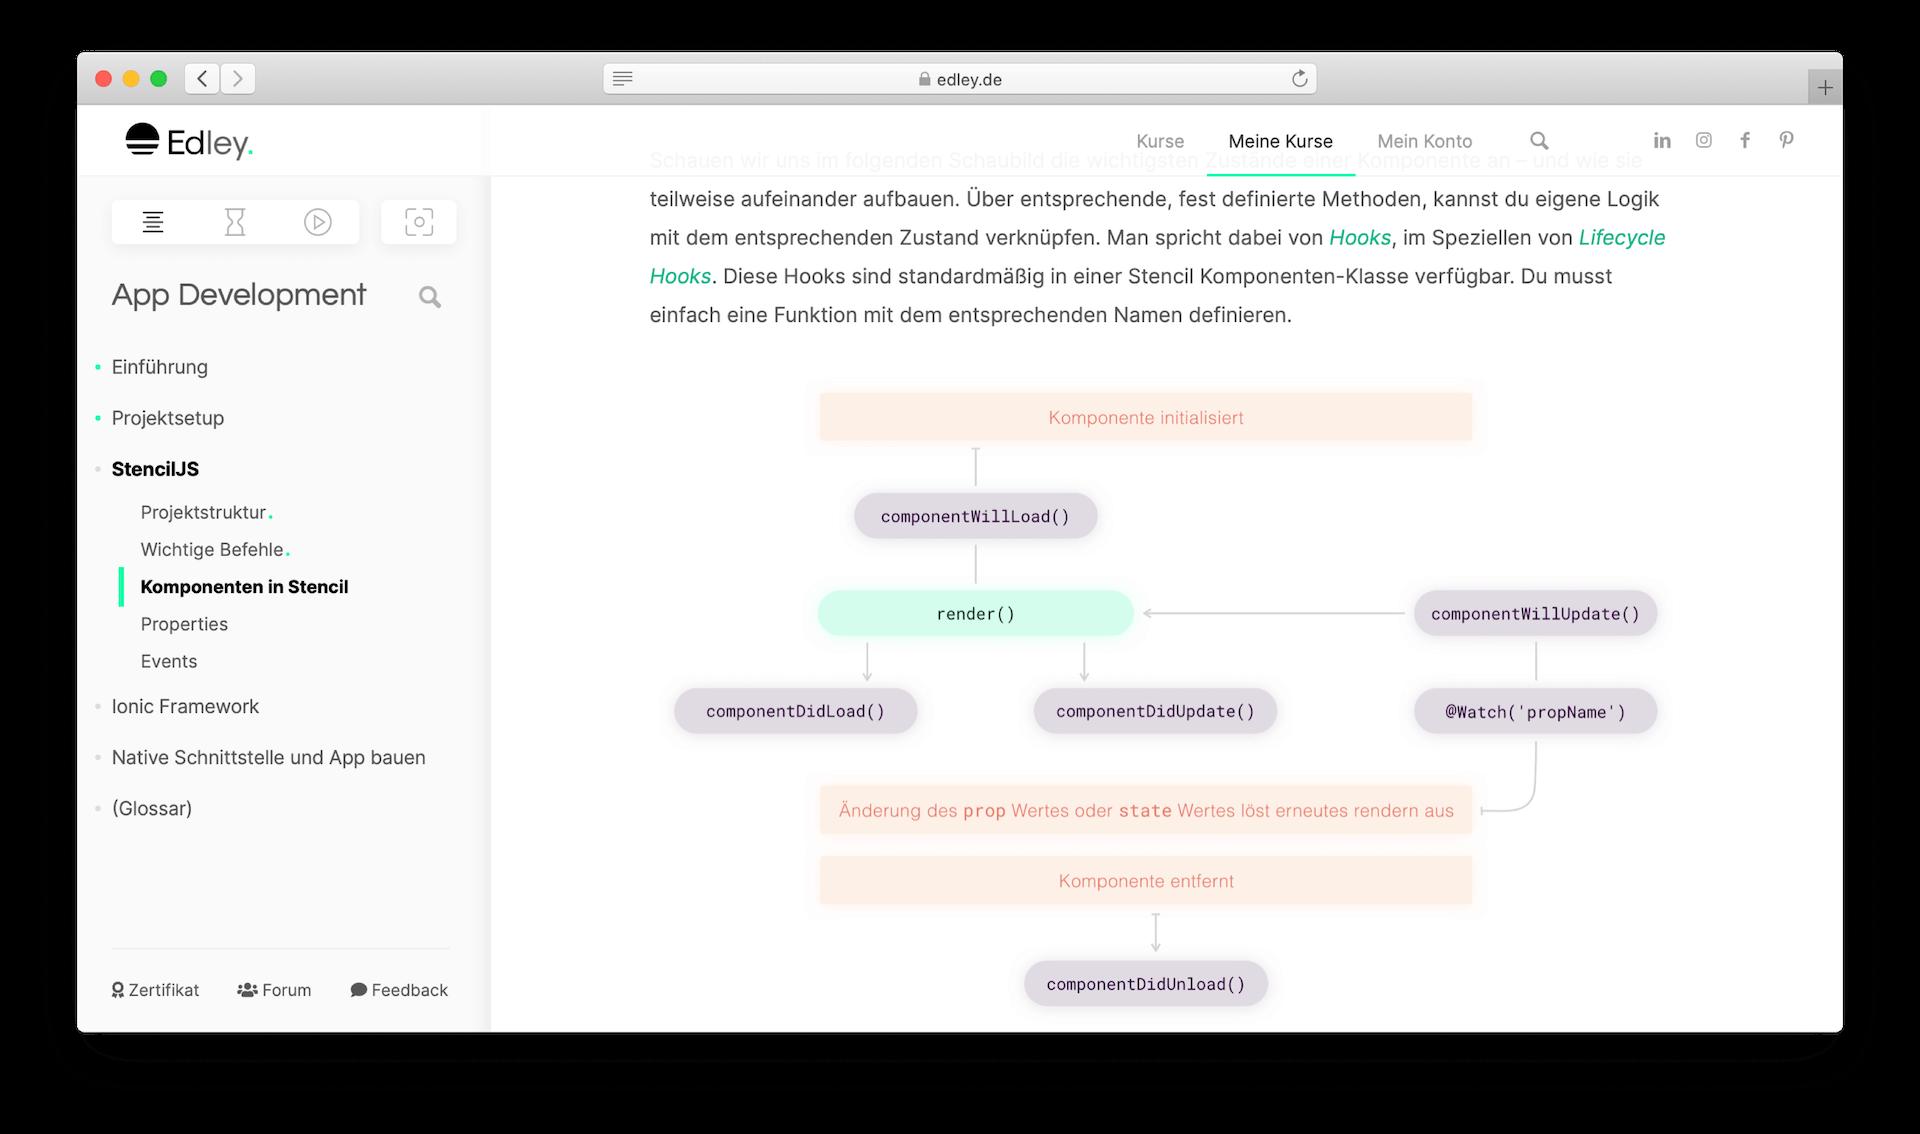 App programmieren Kurs online